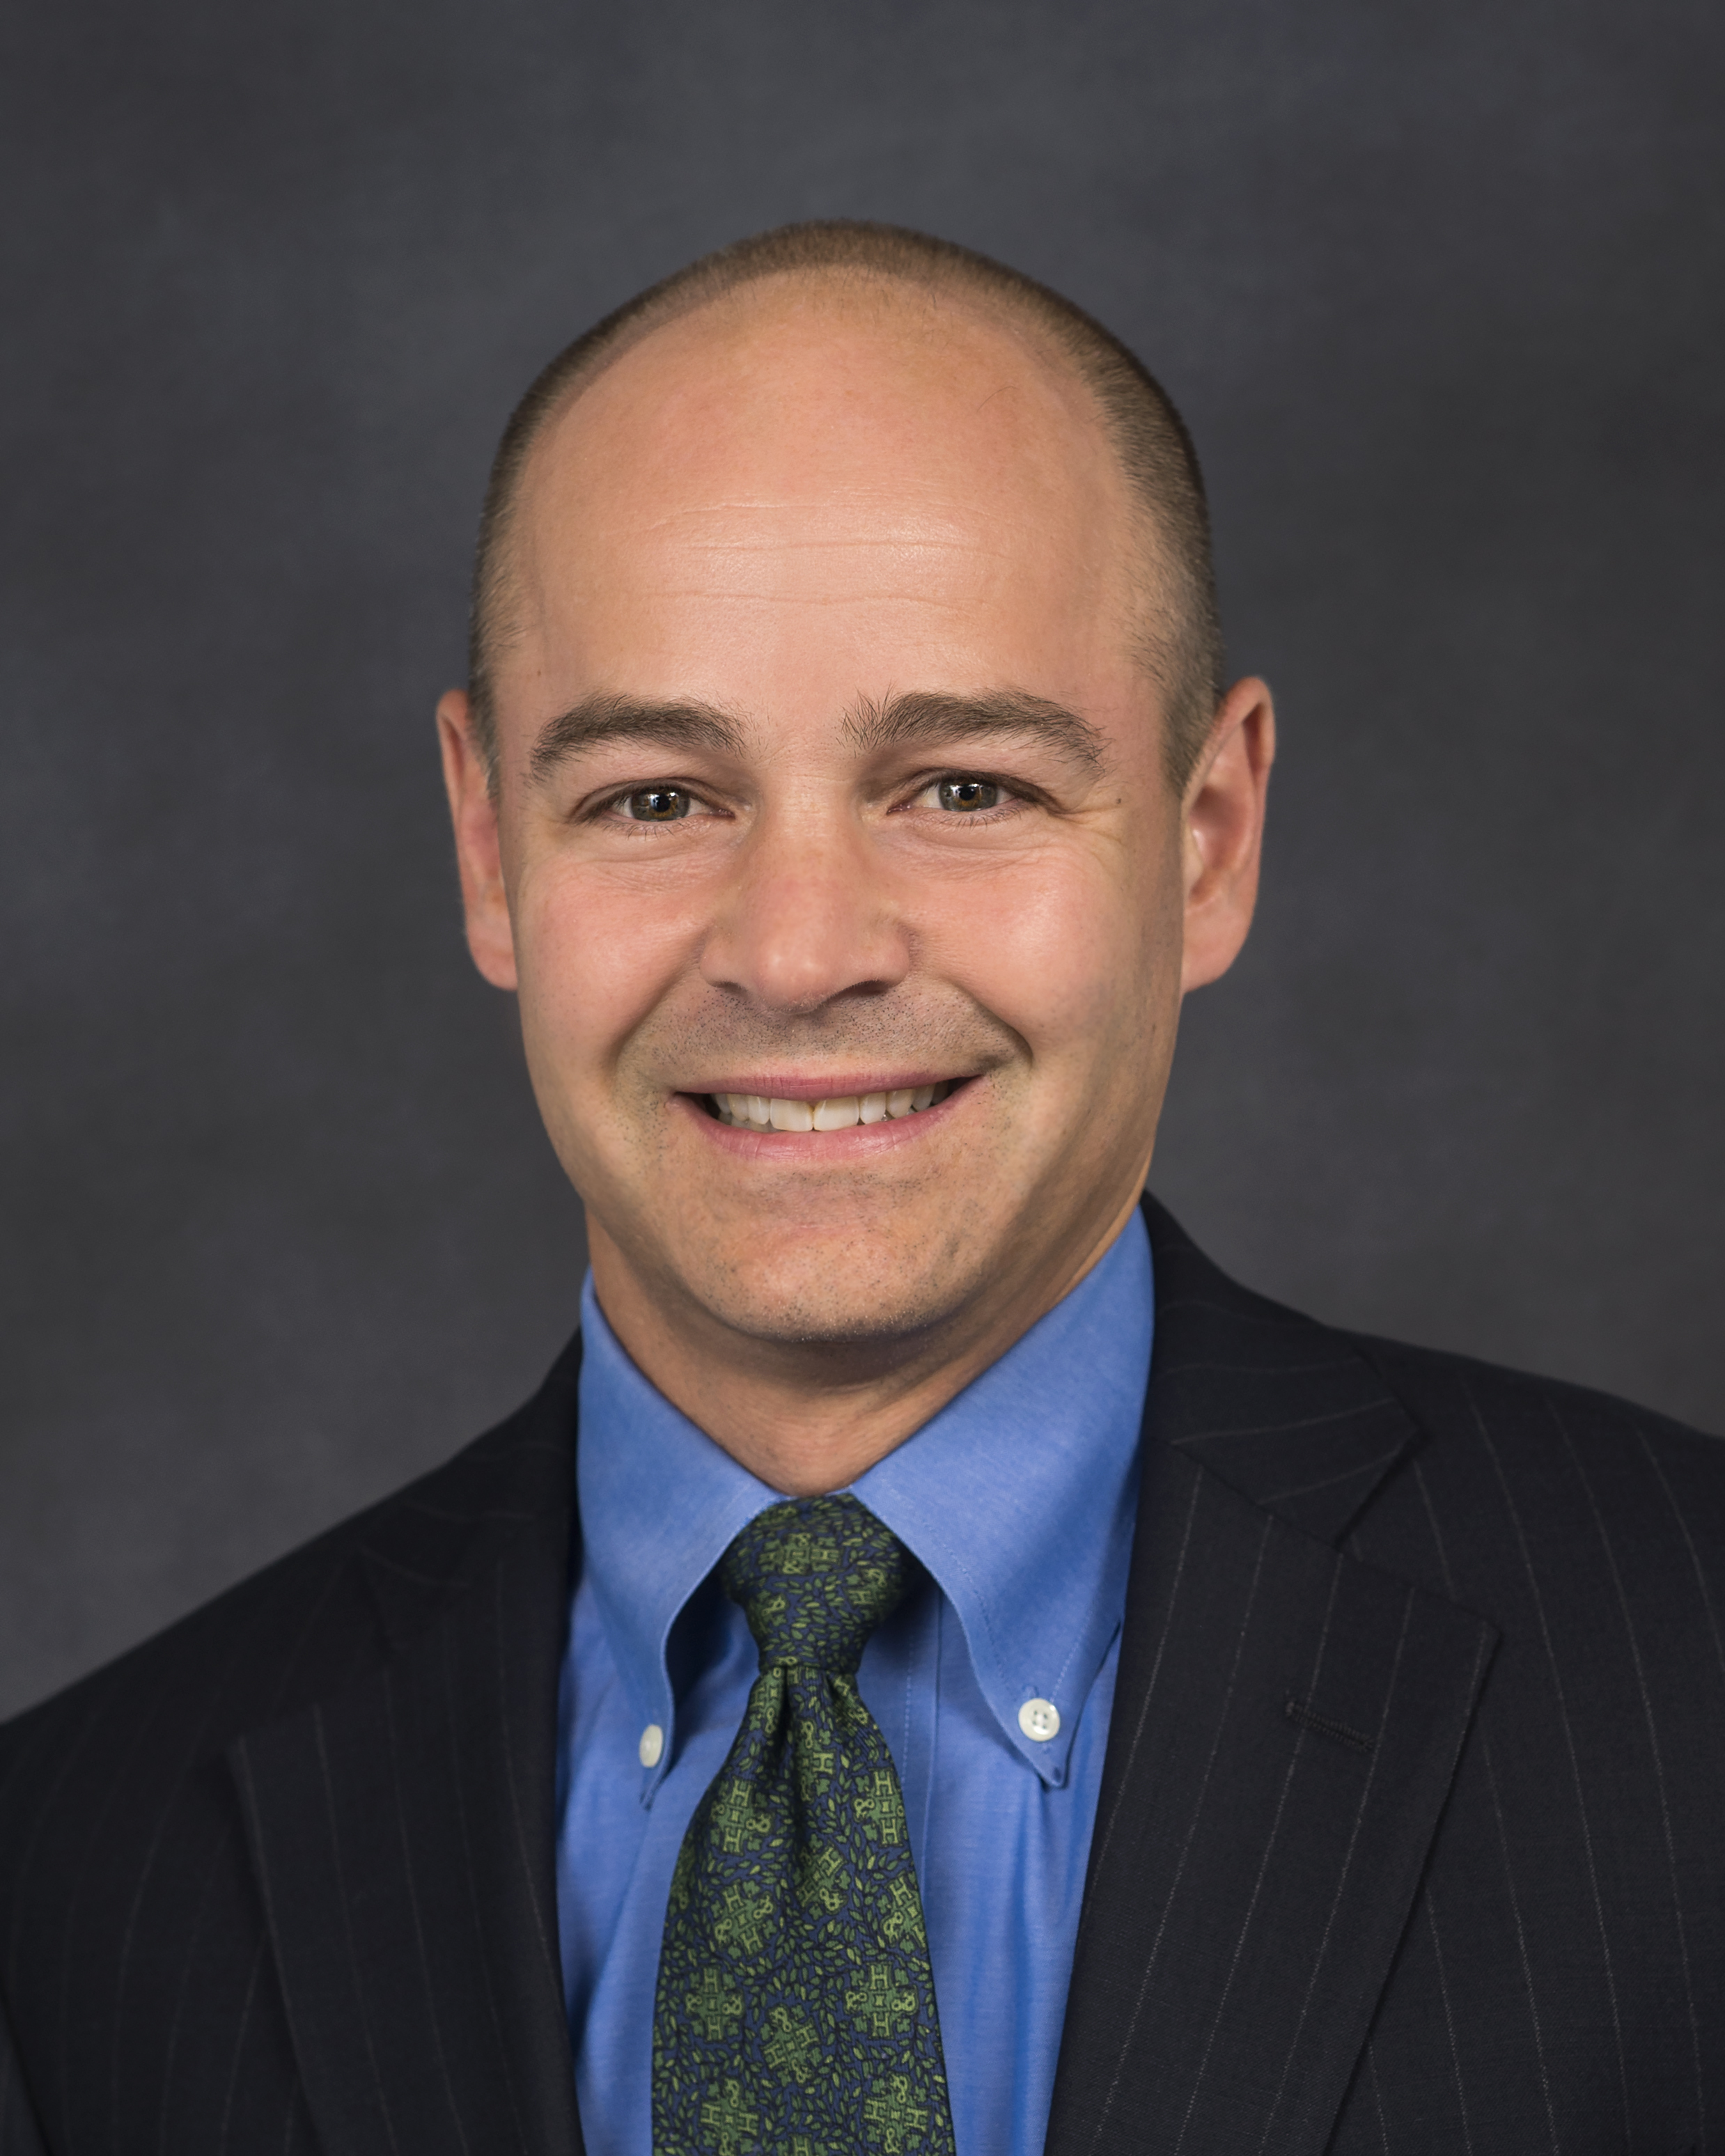 The University of Miami has appointed John Haller as the new Vice President of Enrollment Management - john_haller_headshot